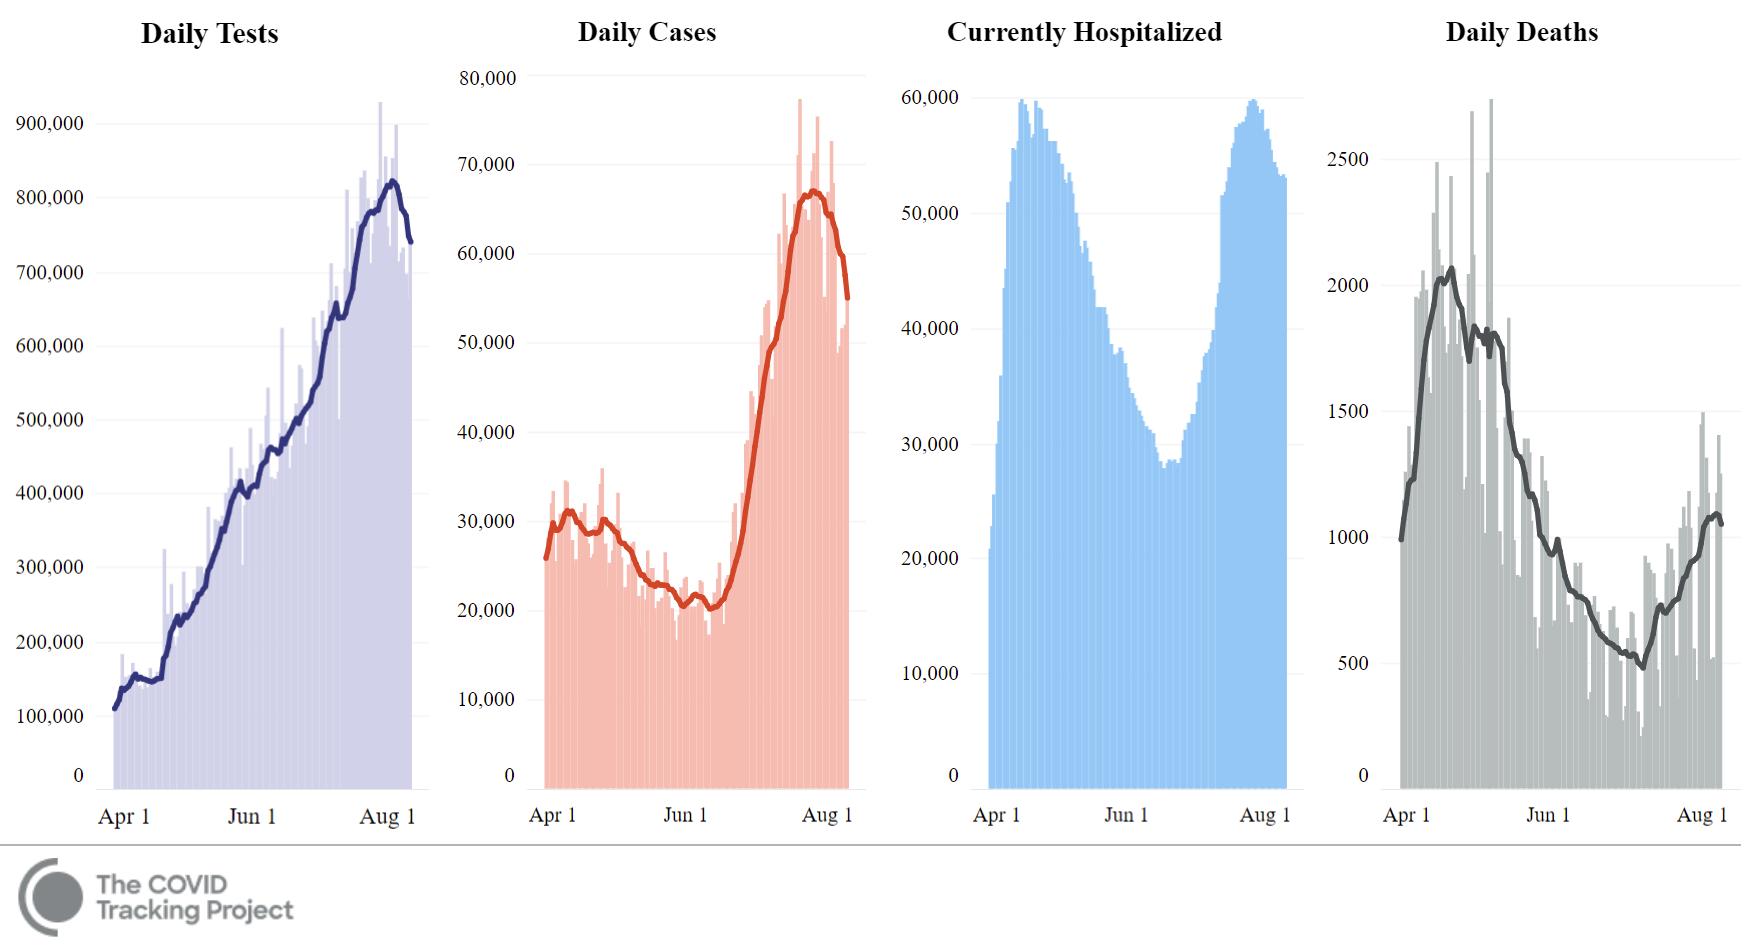 U.S. Key COVID-19 Metrics - Charts